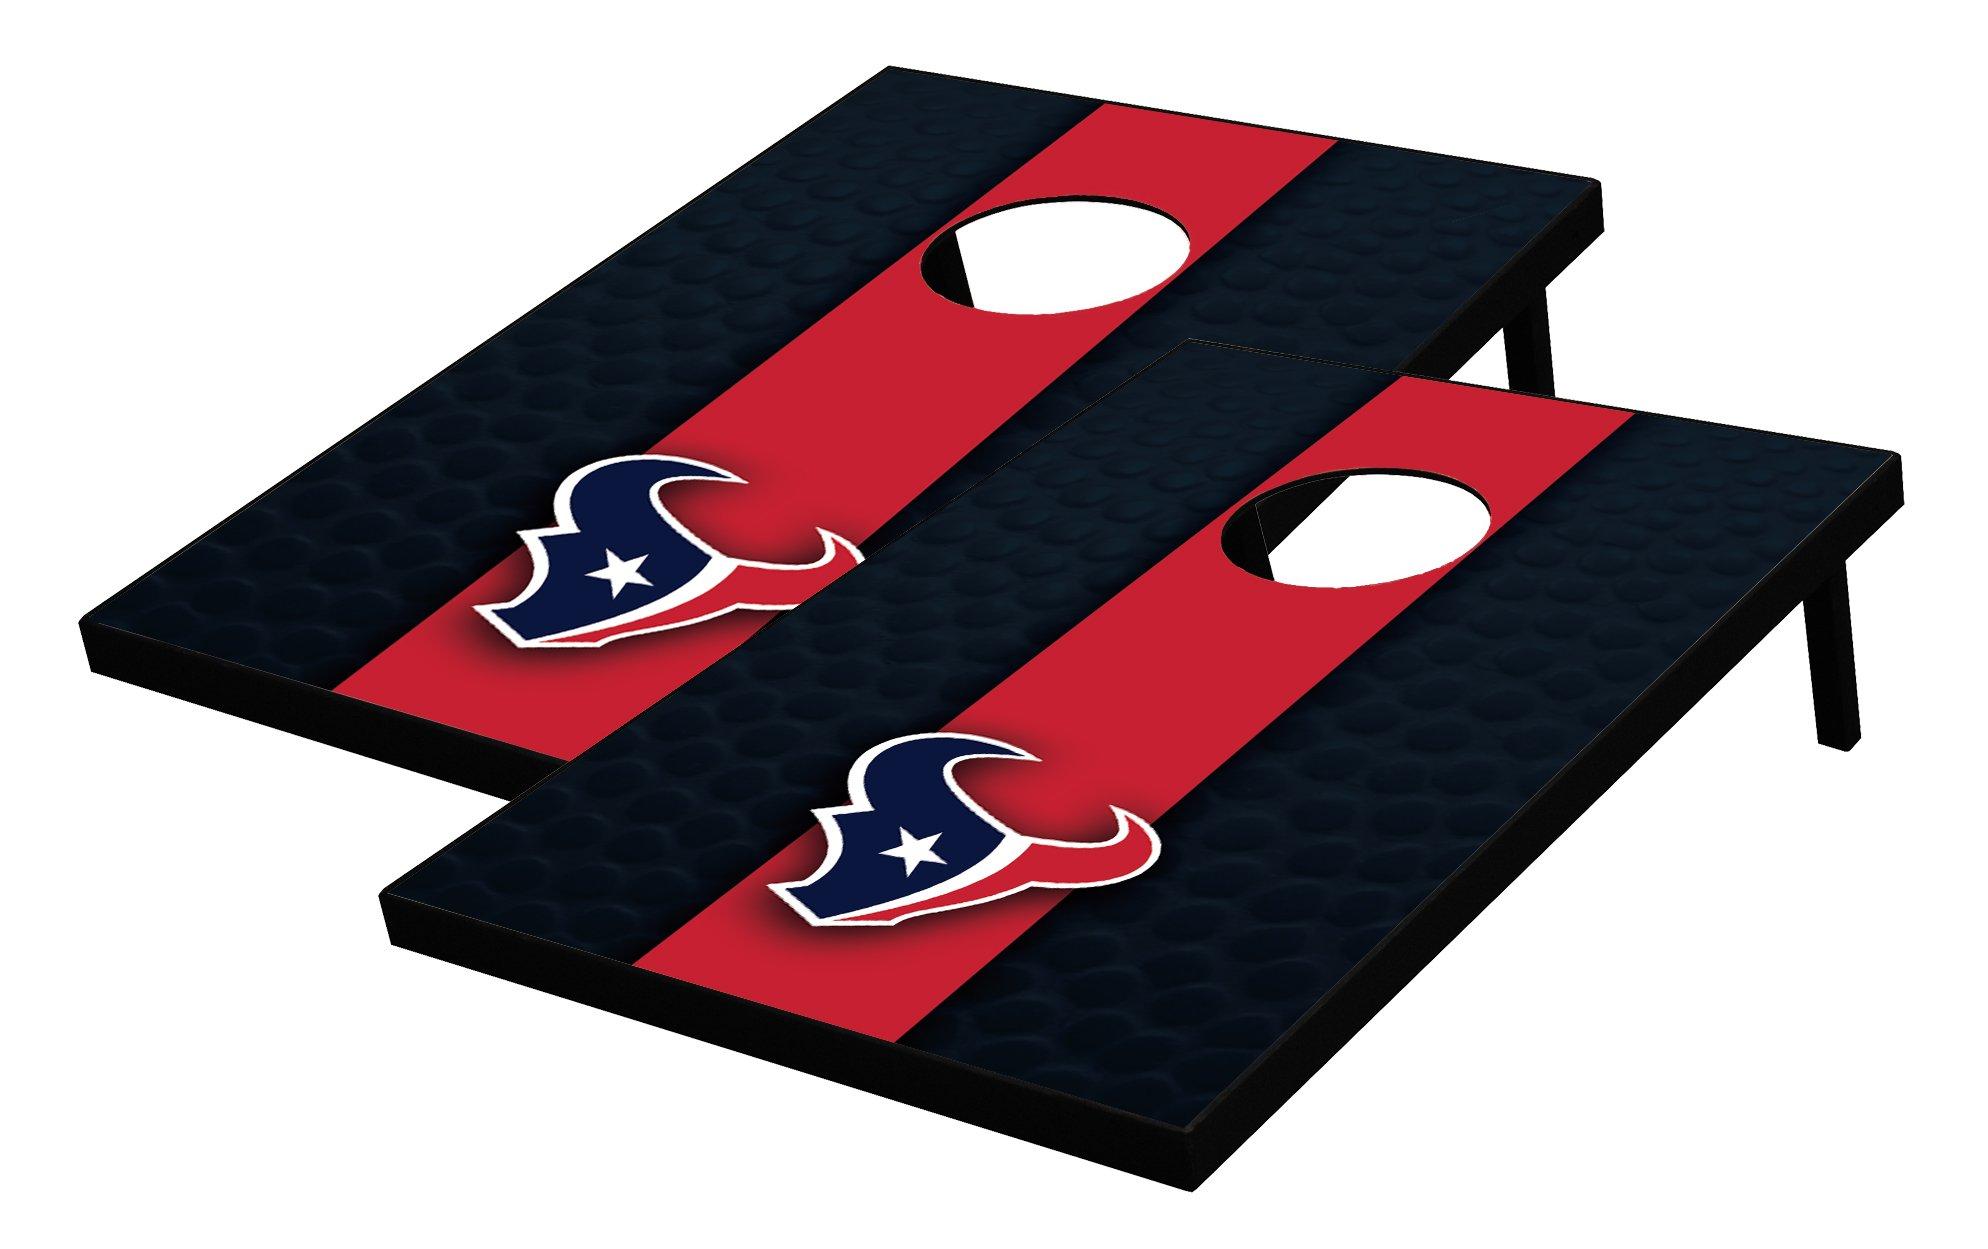 Wild Sports 2'x3' NFL Houston Texans Cornhole Set